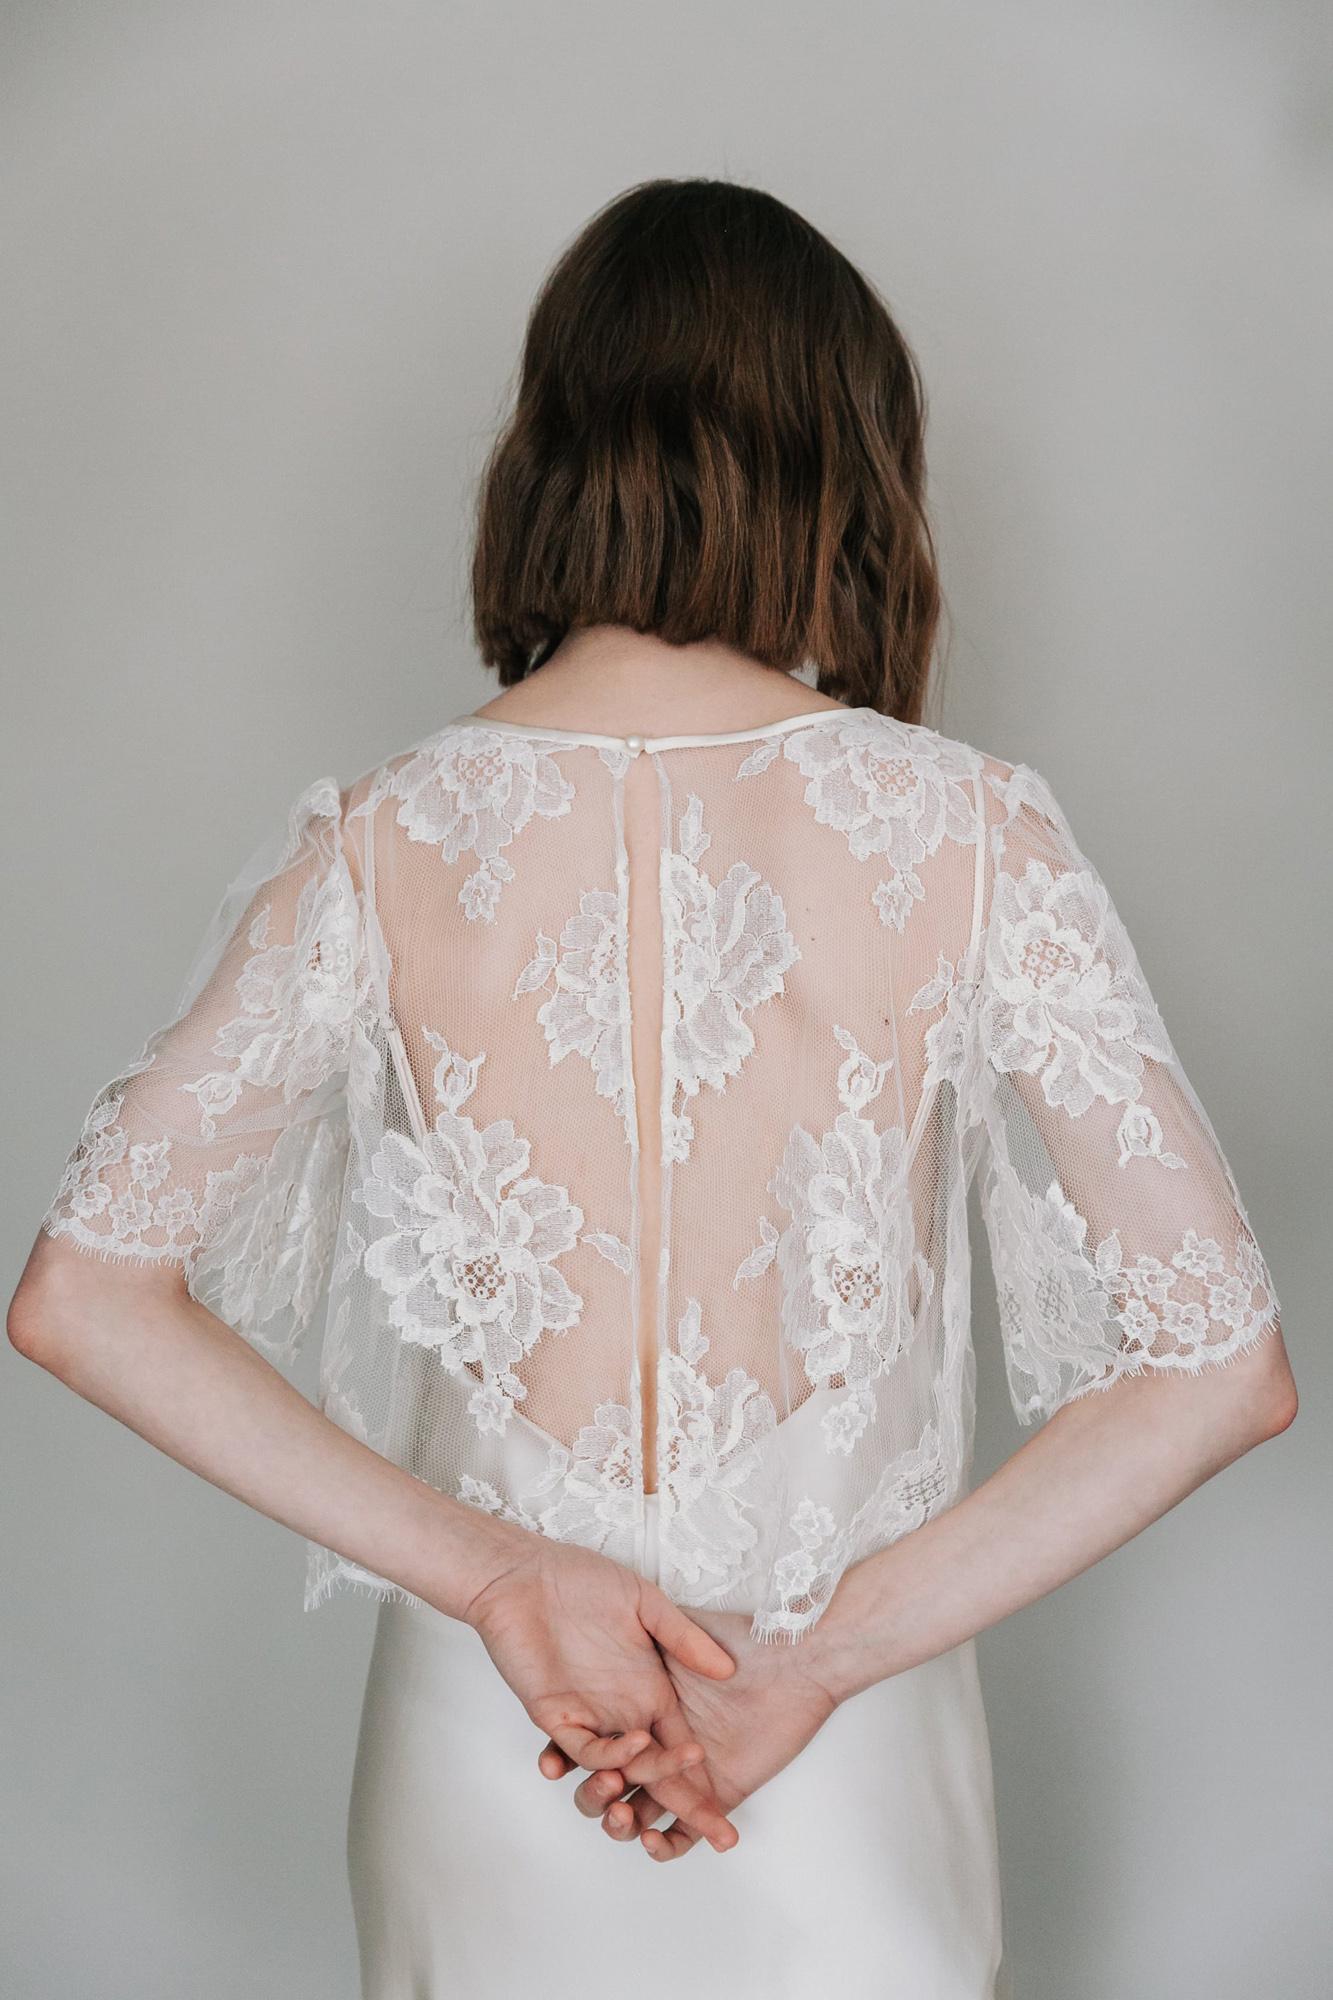 Kate-Beaumont-Sheffield-Rosa-Floral-Lace-Jacket-Camellia-Bias-Cut-Silk-Wedding-Gown-8.jpg